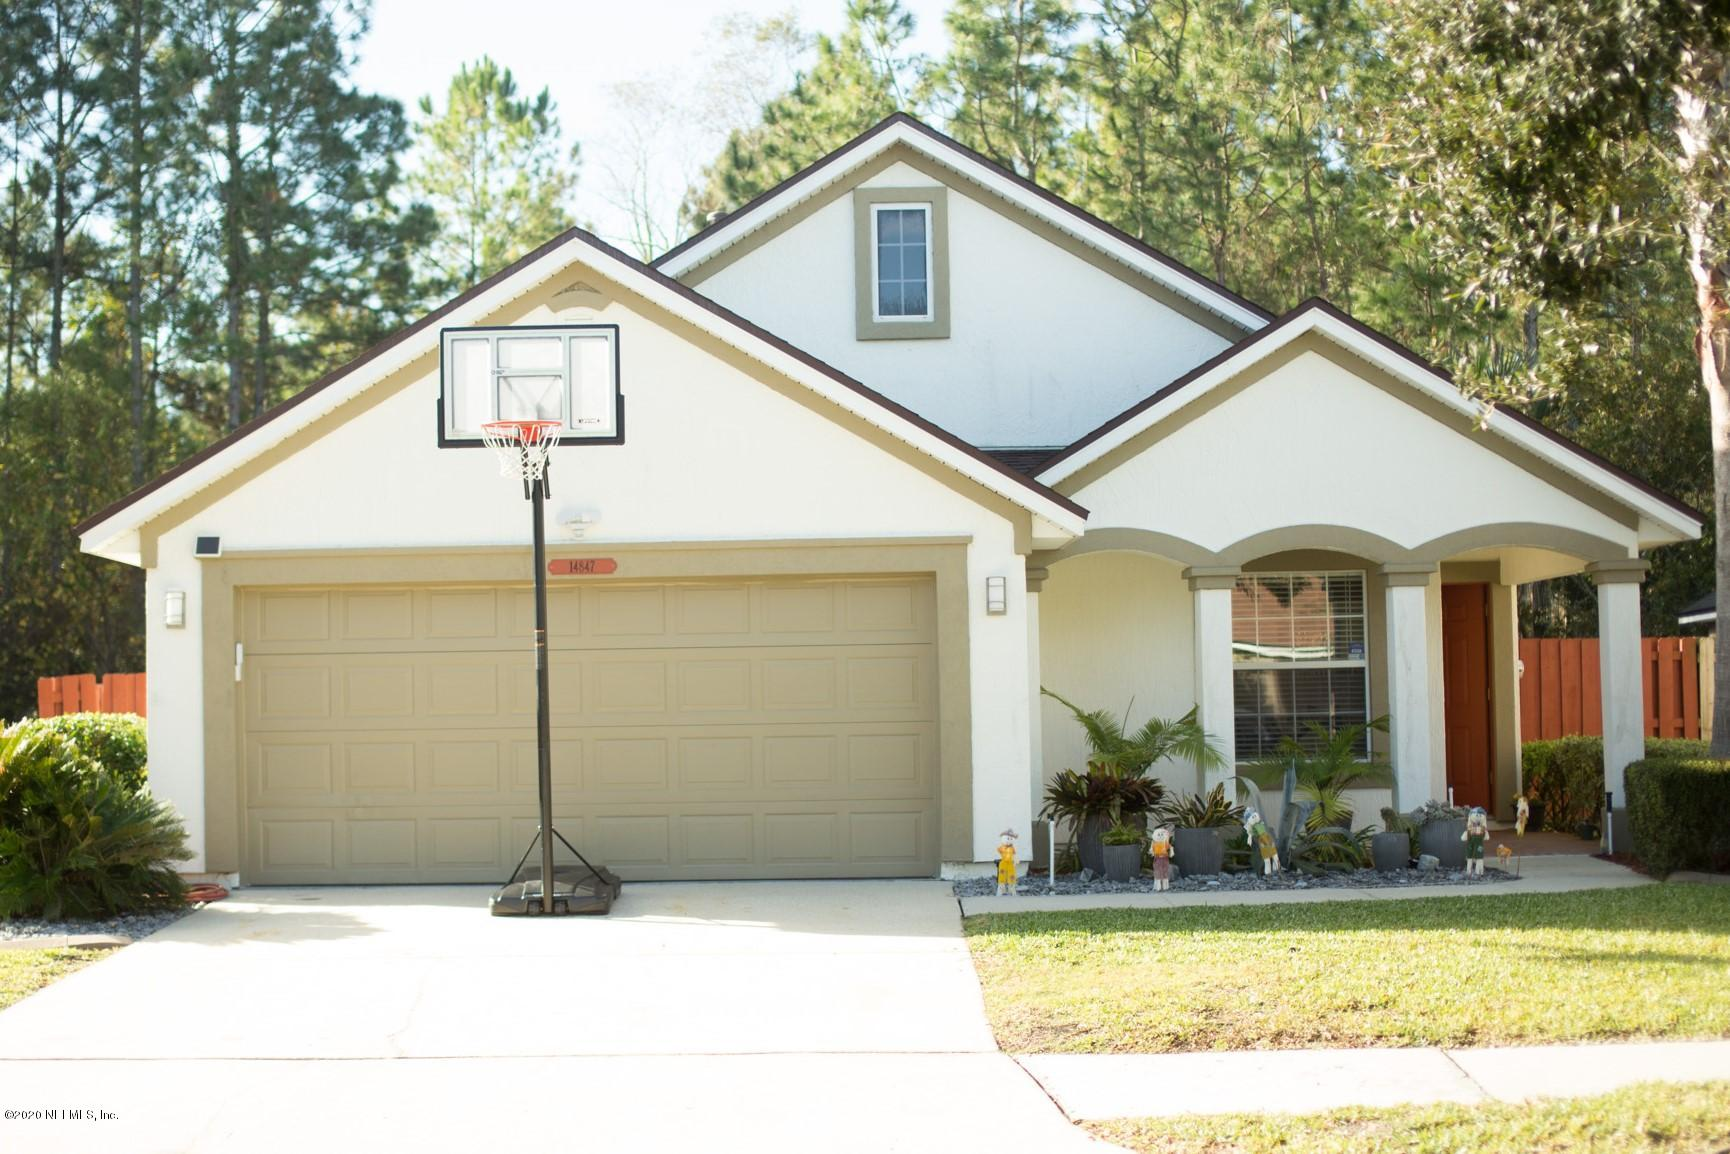 14847 FERN HAMMOCK, JACKSONVILLE, FLORIDA 32258, 4 Bedrooms Bedrooms, ,2 BathroomsBathrooms,Residential,For sale,FERN HAMMOCK,1066172